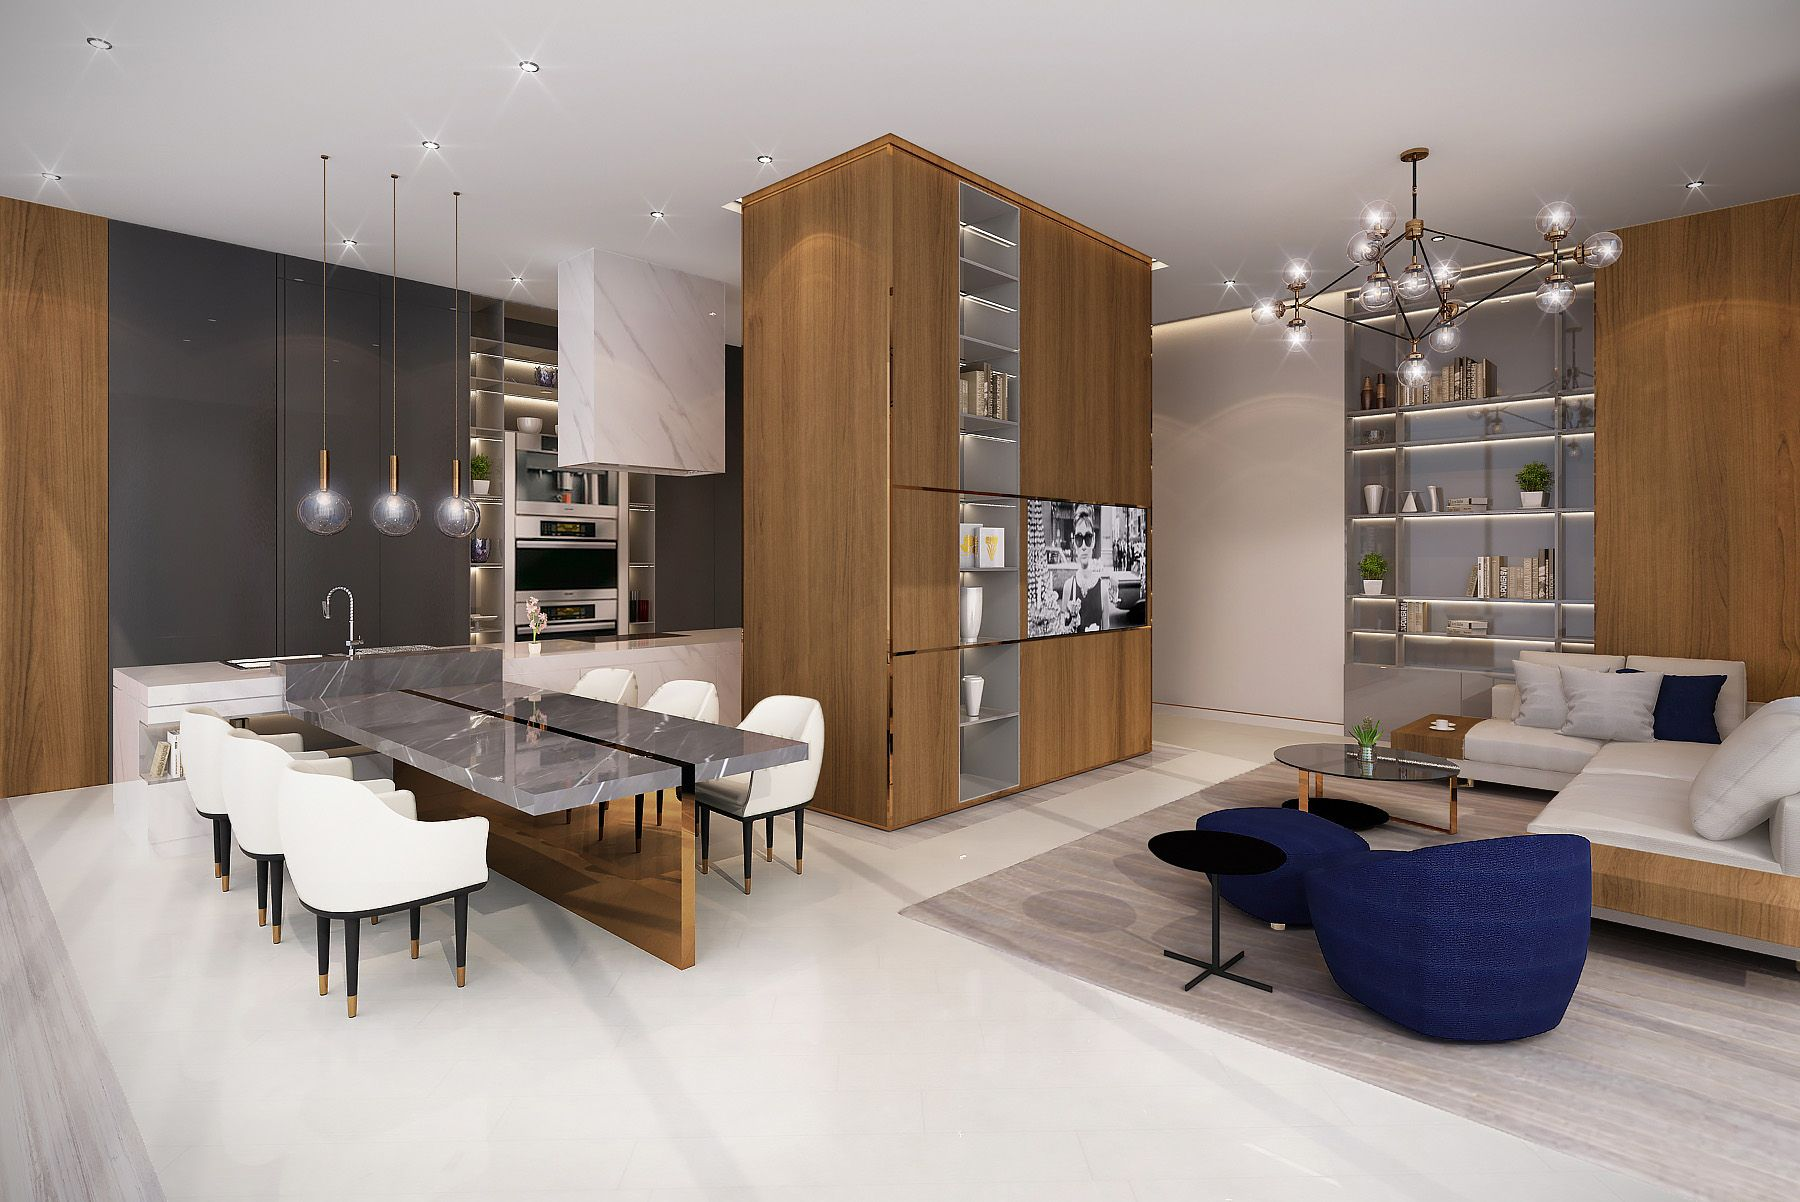 Swiss Bureau Interior Design Al Habtoor Penthouses Dubai UAE